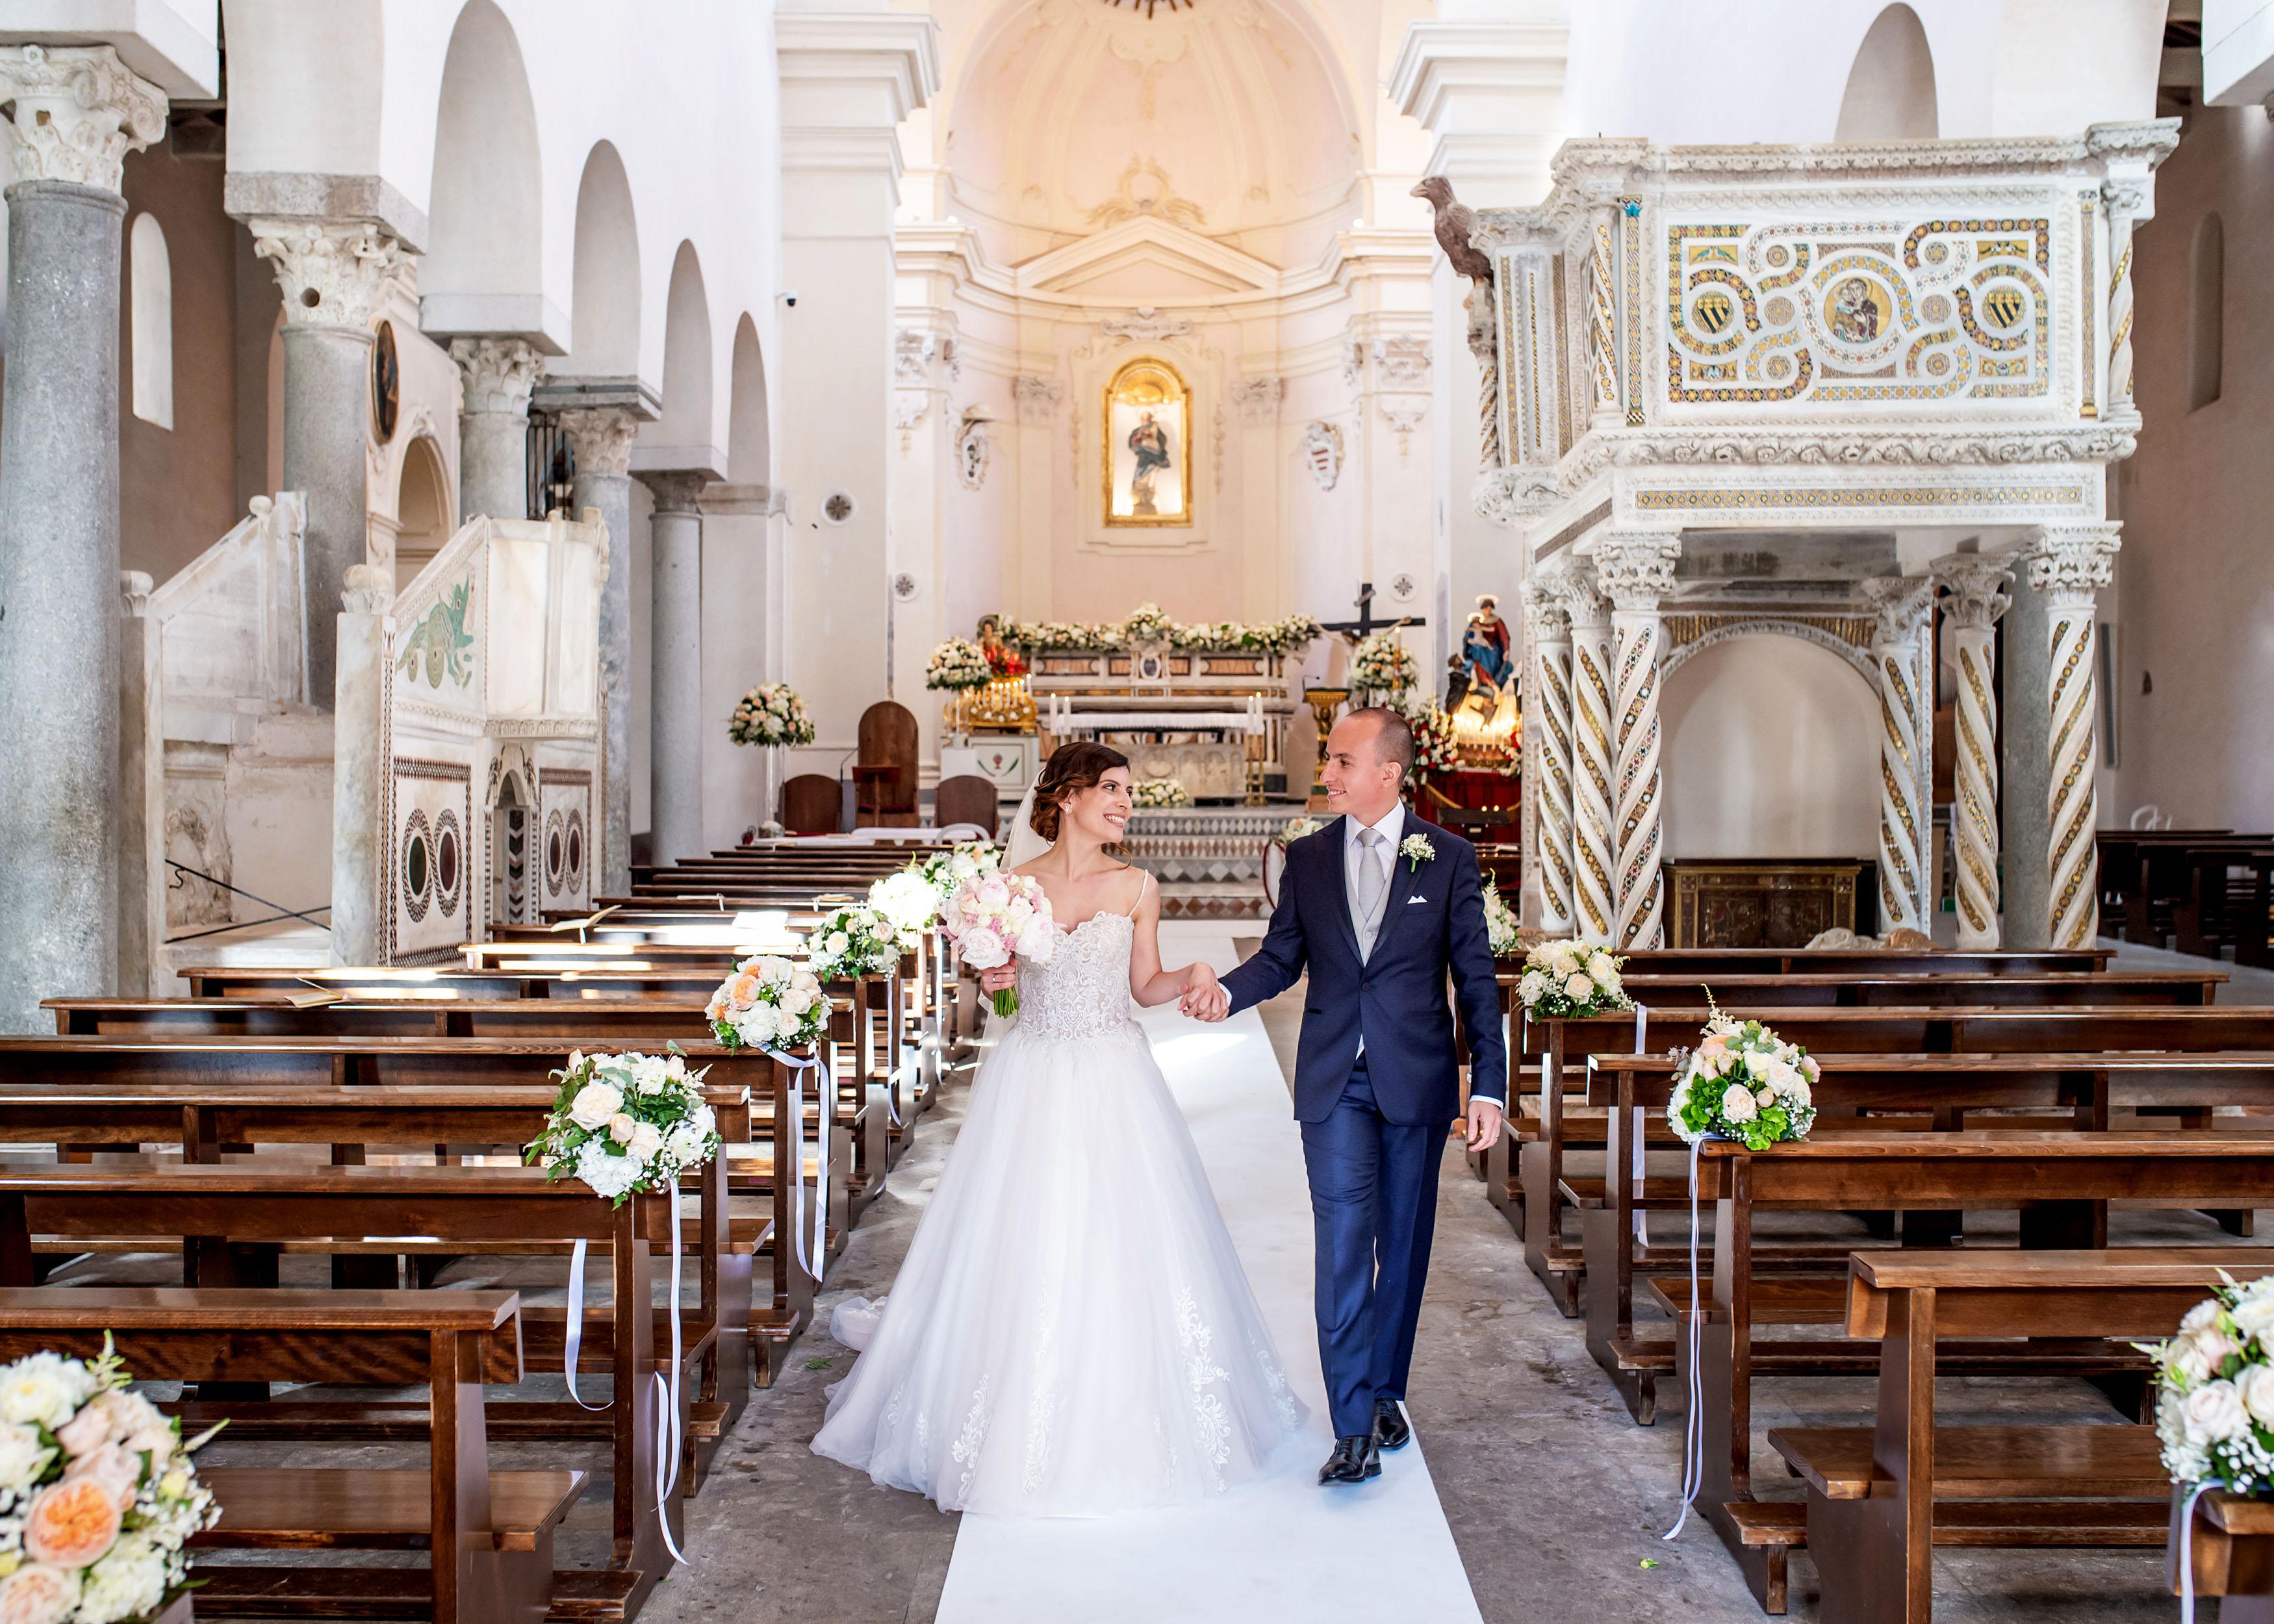 http://www.weddingamalfi.com/wp-content/uploads/Katia-Jorge-18-maggio-2019-28.jpg